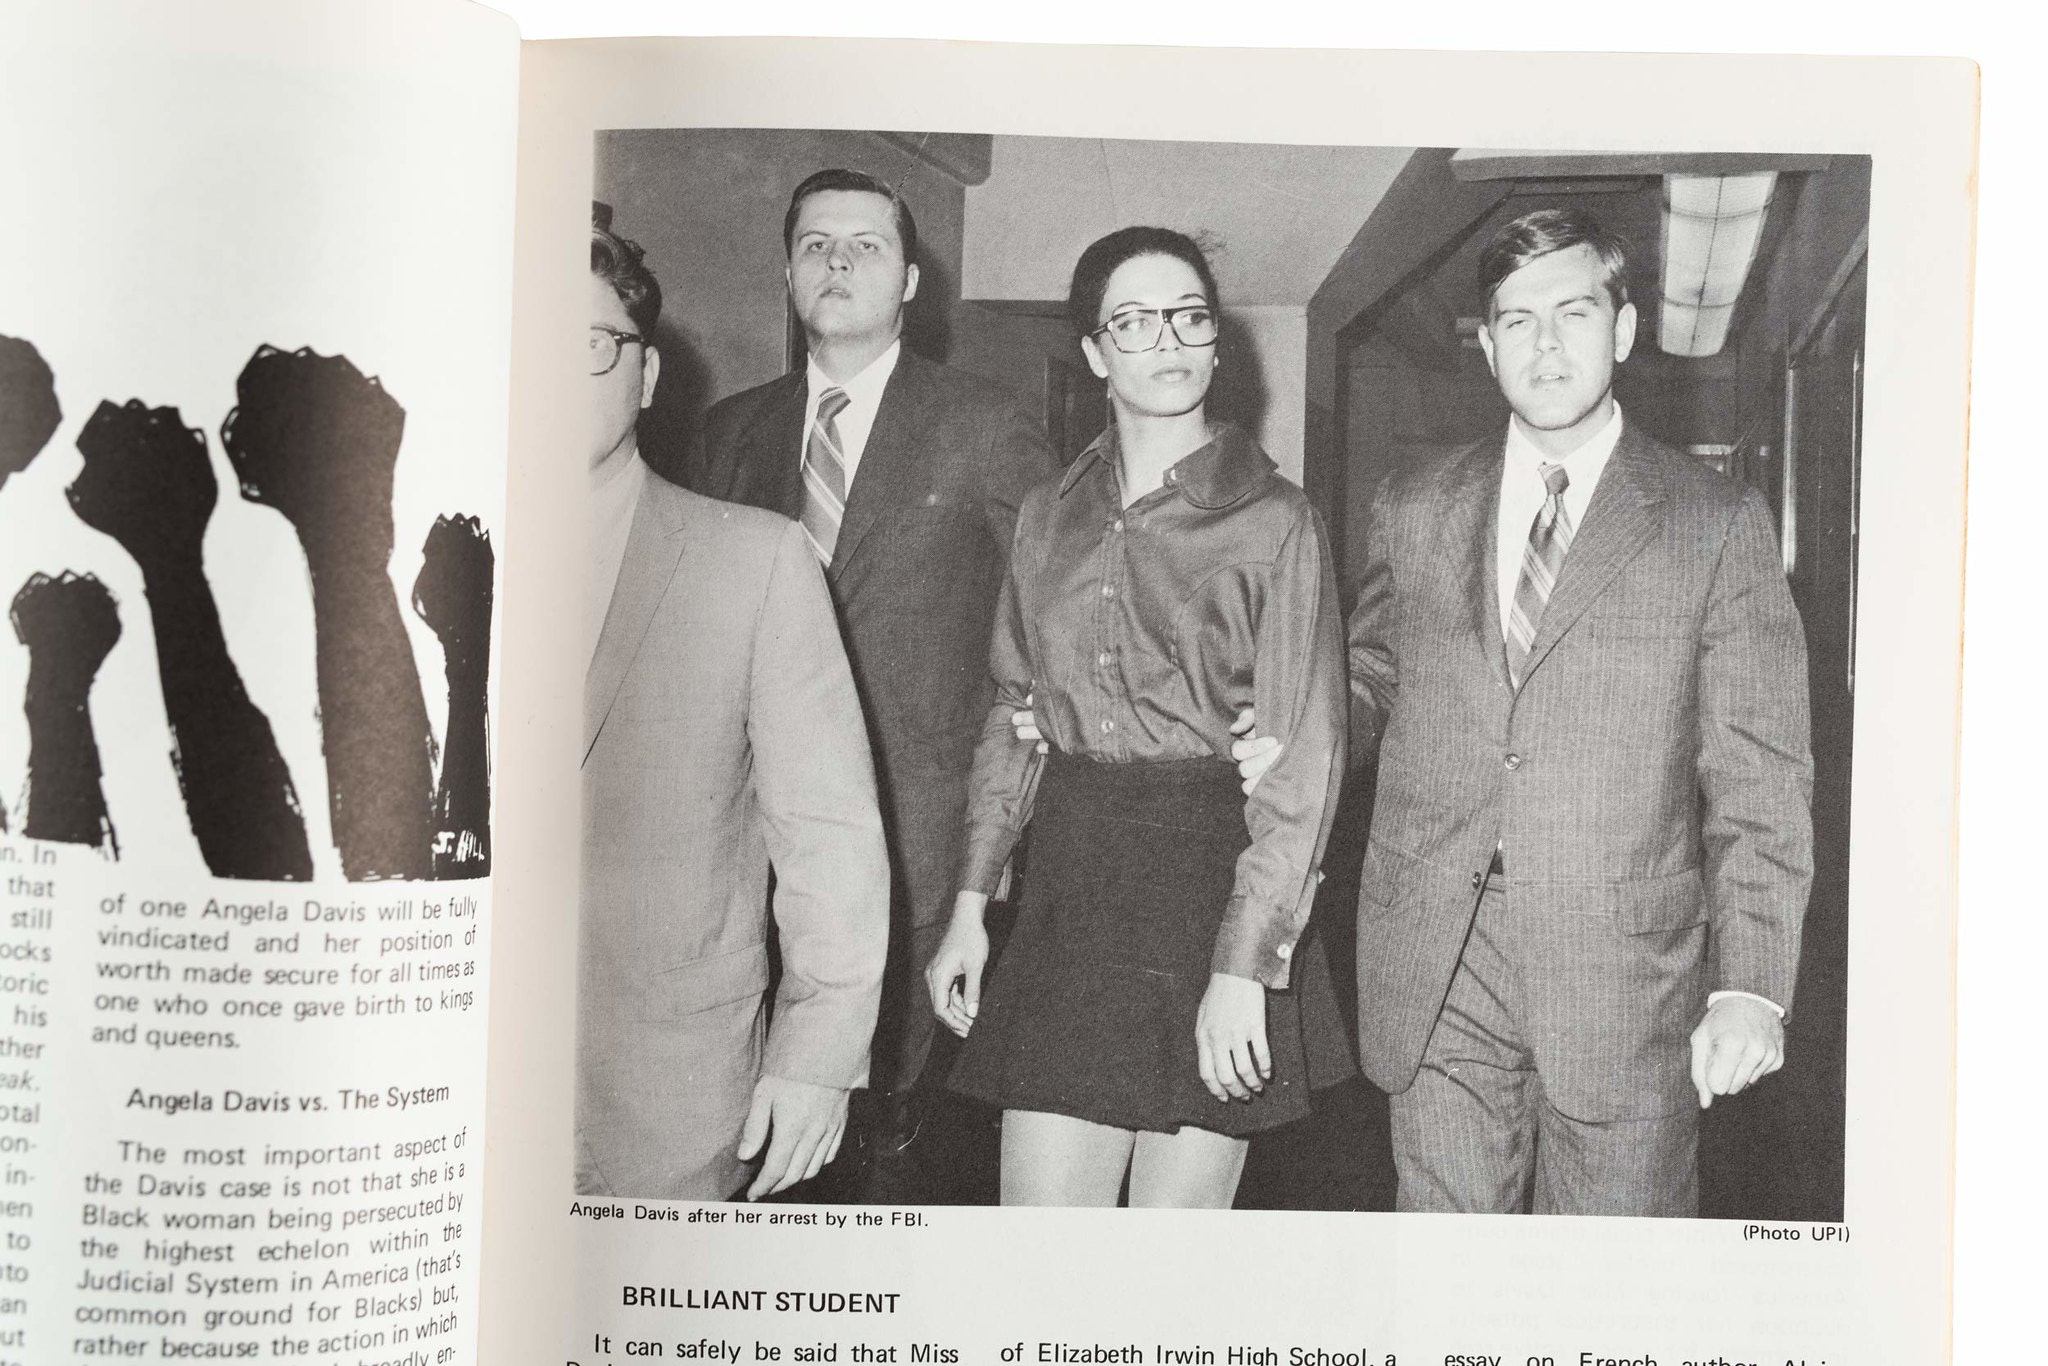 Angela Davis in between two men, each grabbing one of her arms.